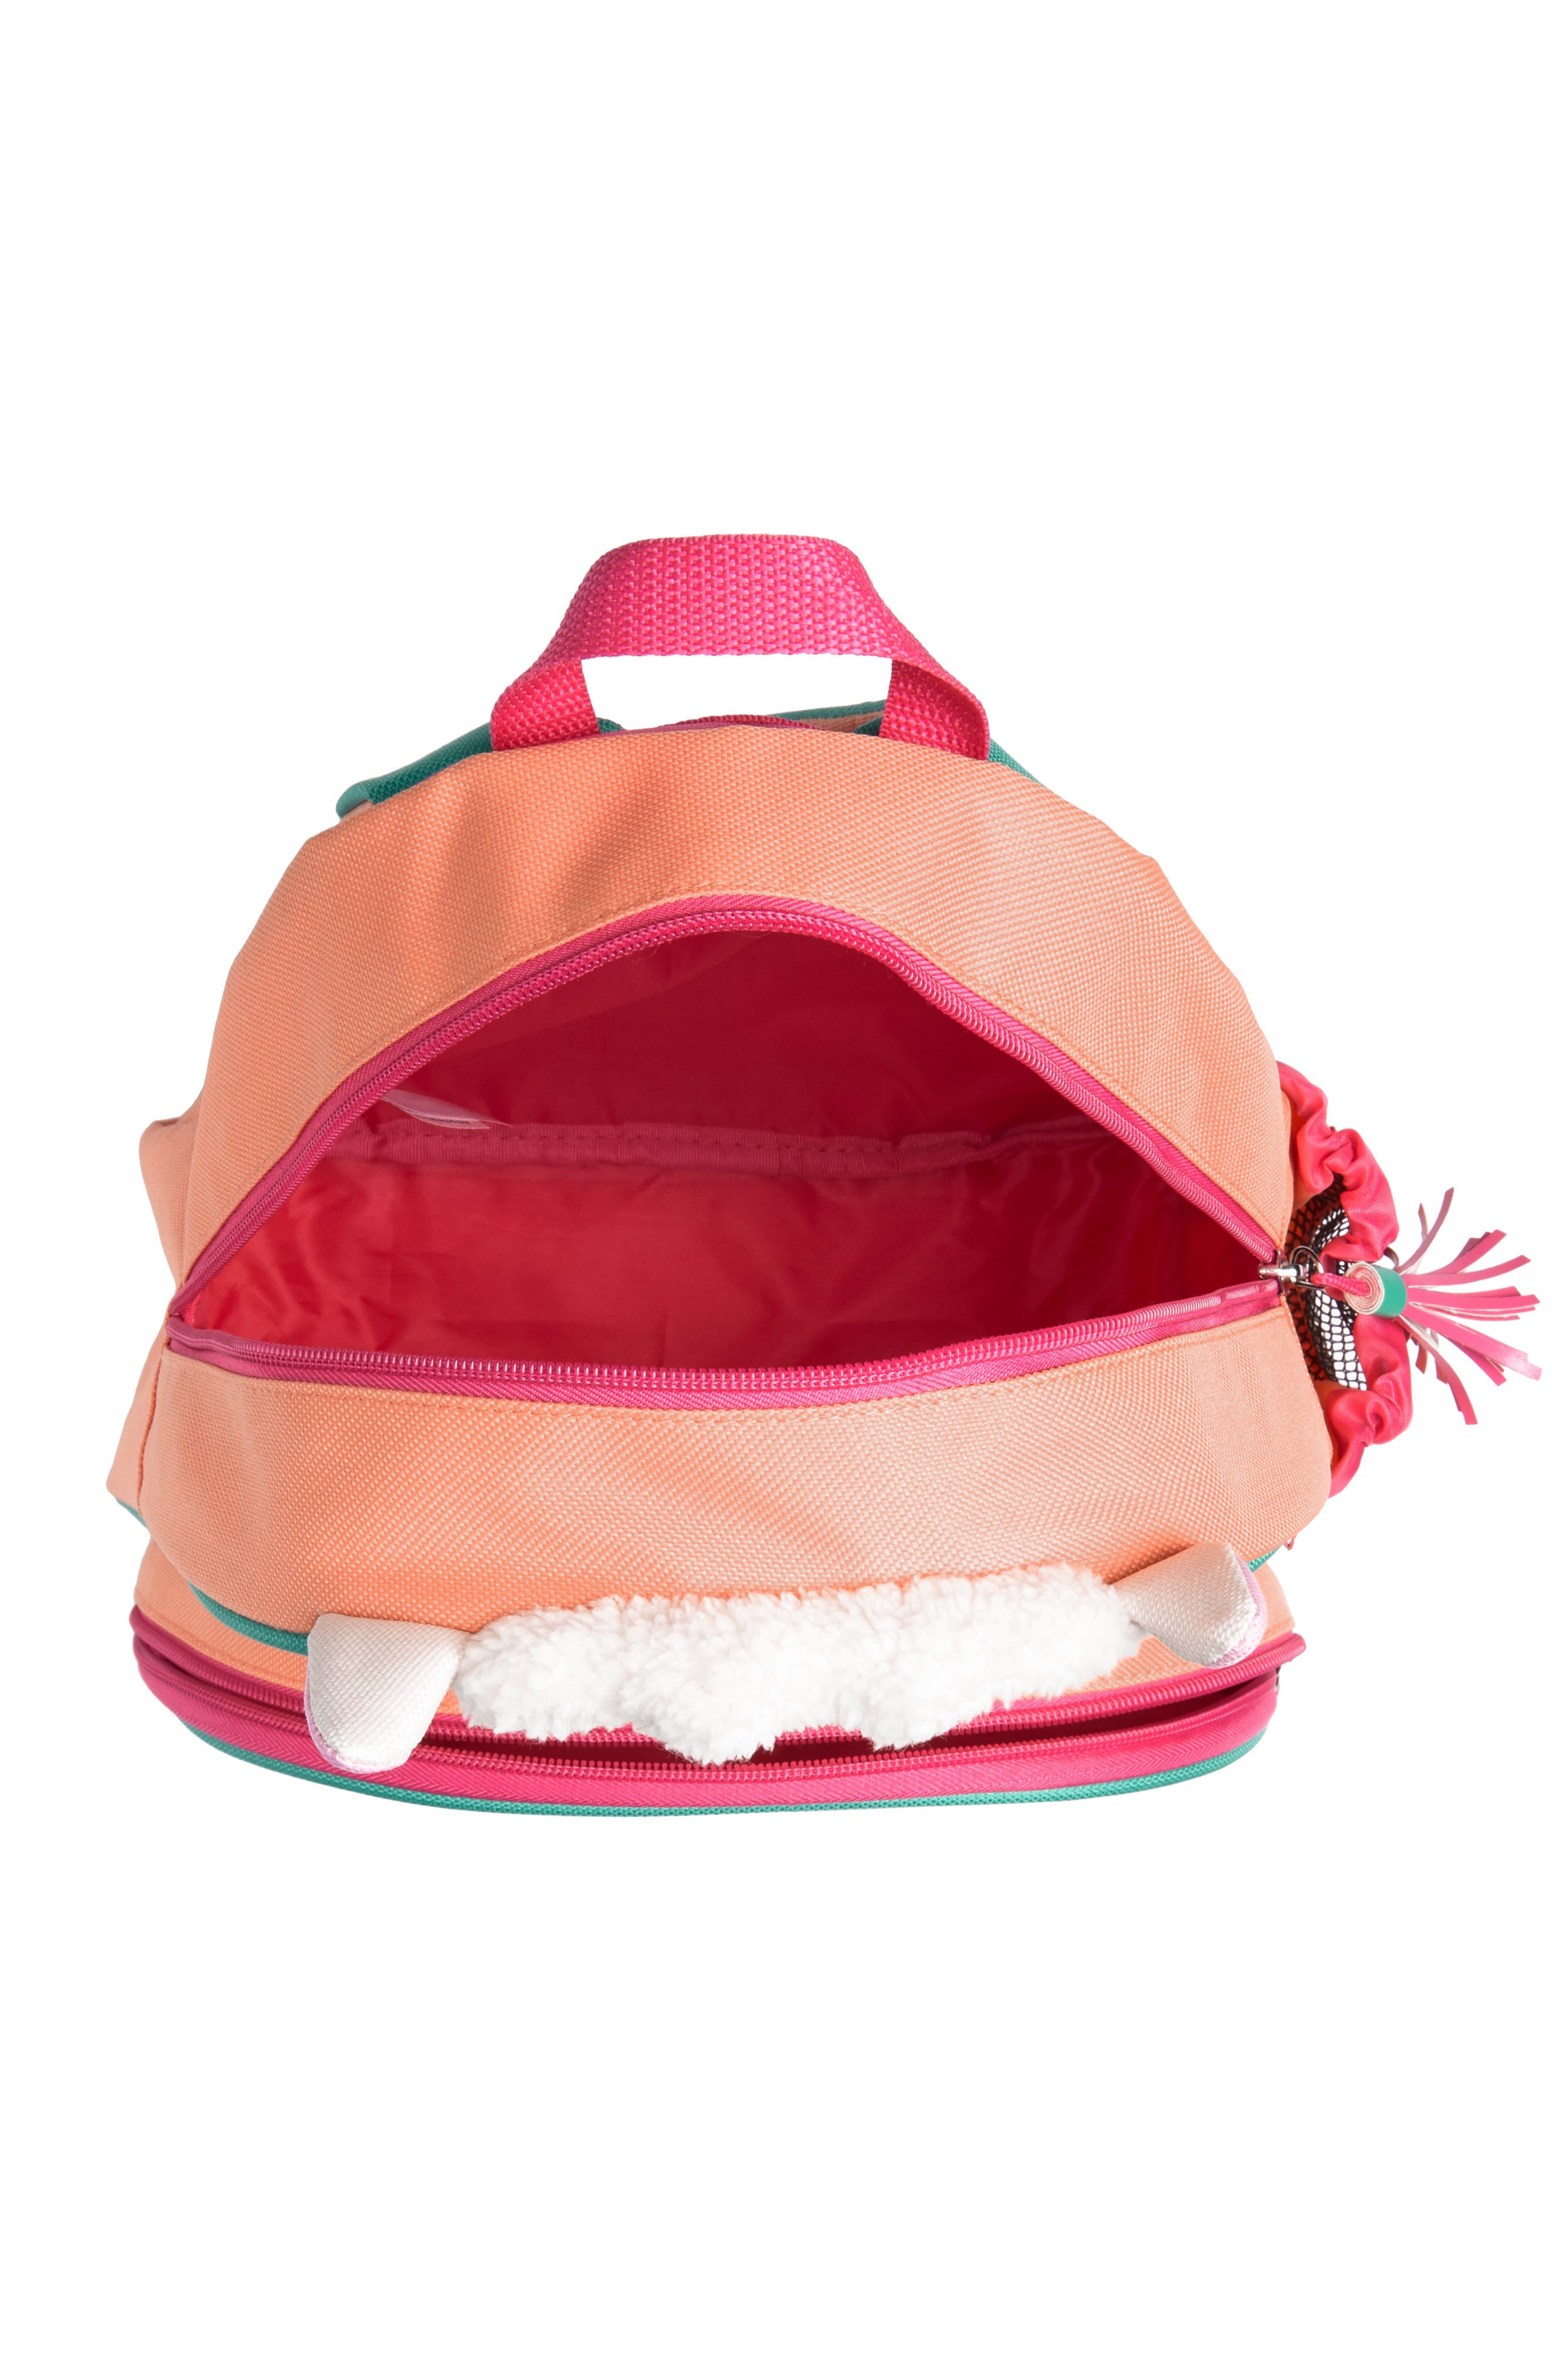 SKIP HOP, Zoo Pack Llama Backpack, Alternate thumbnail 3, color, PINK MULTI